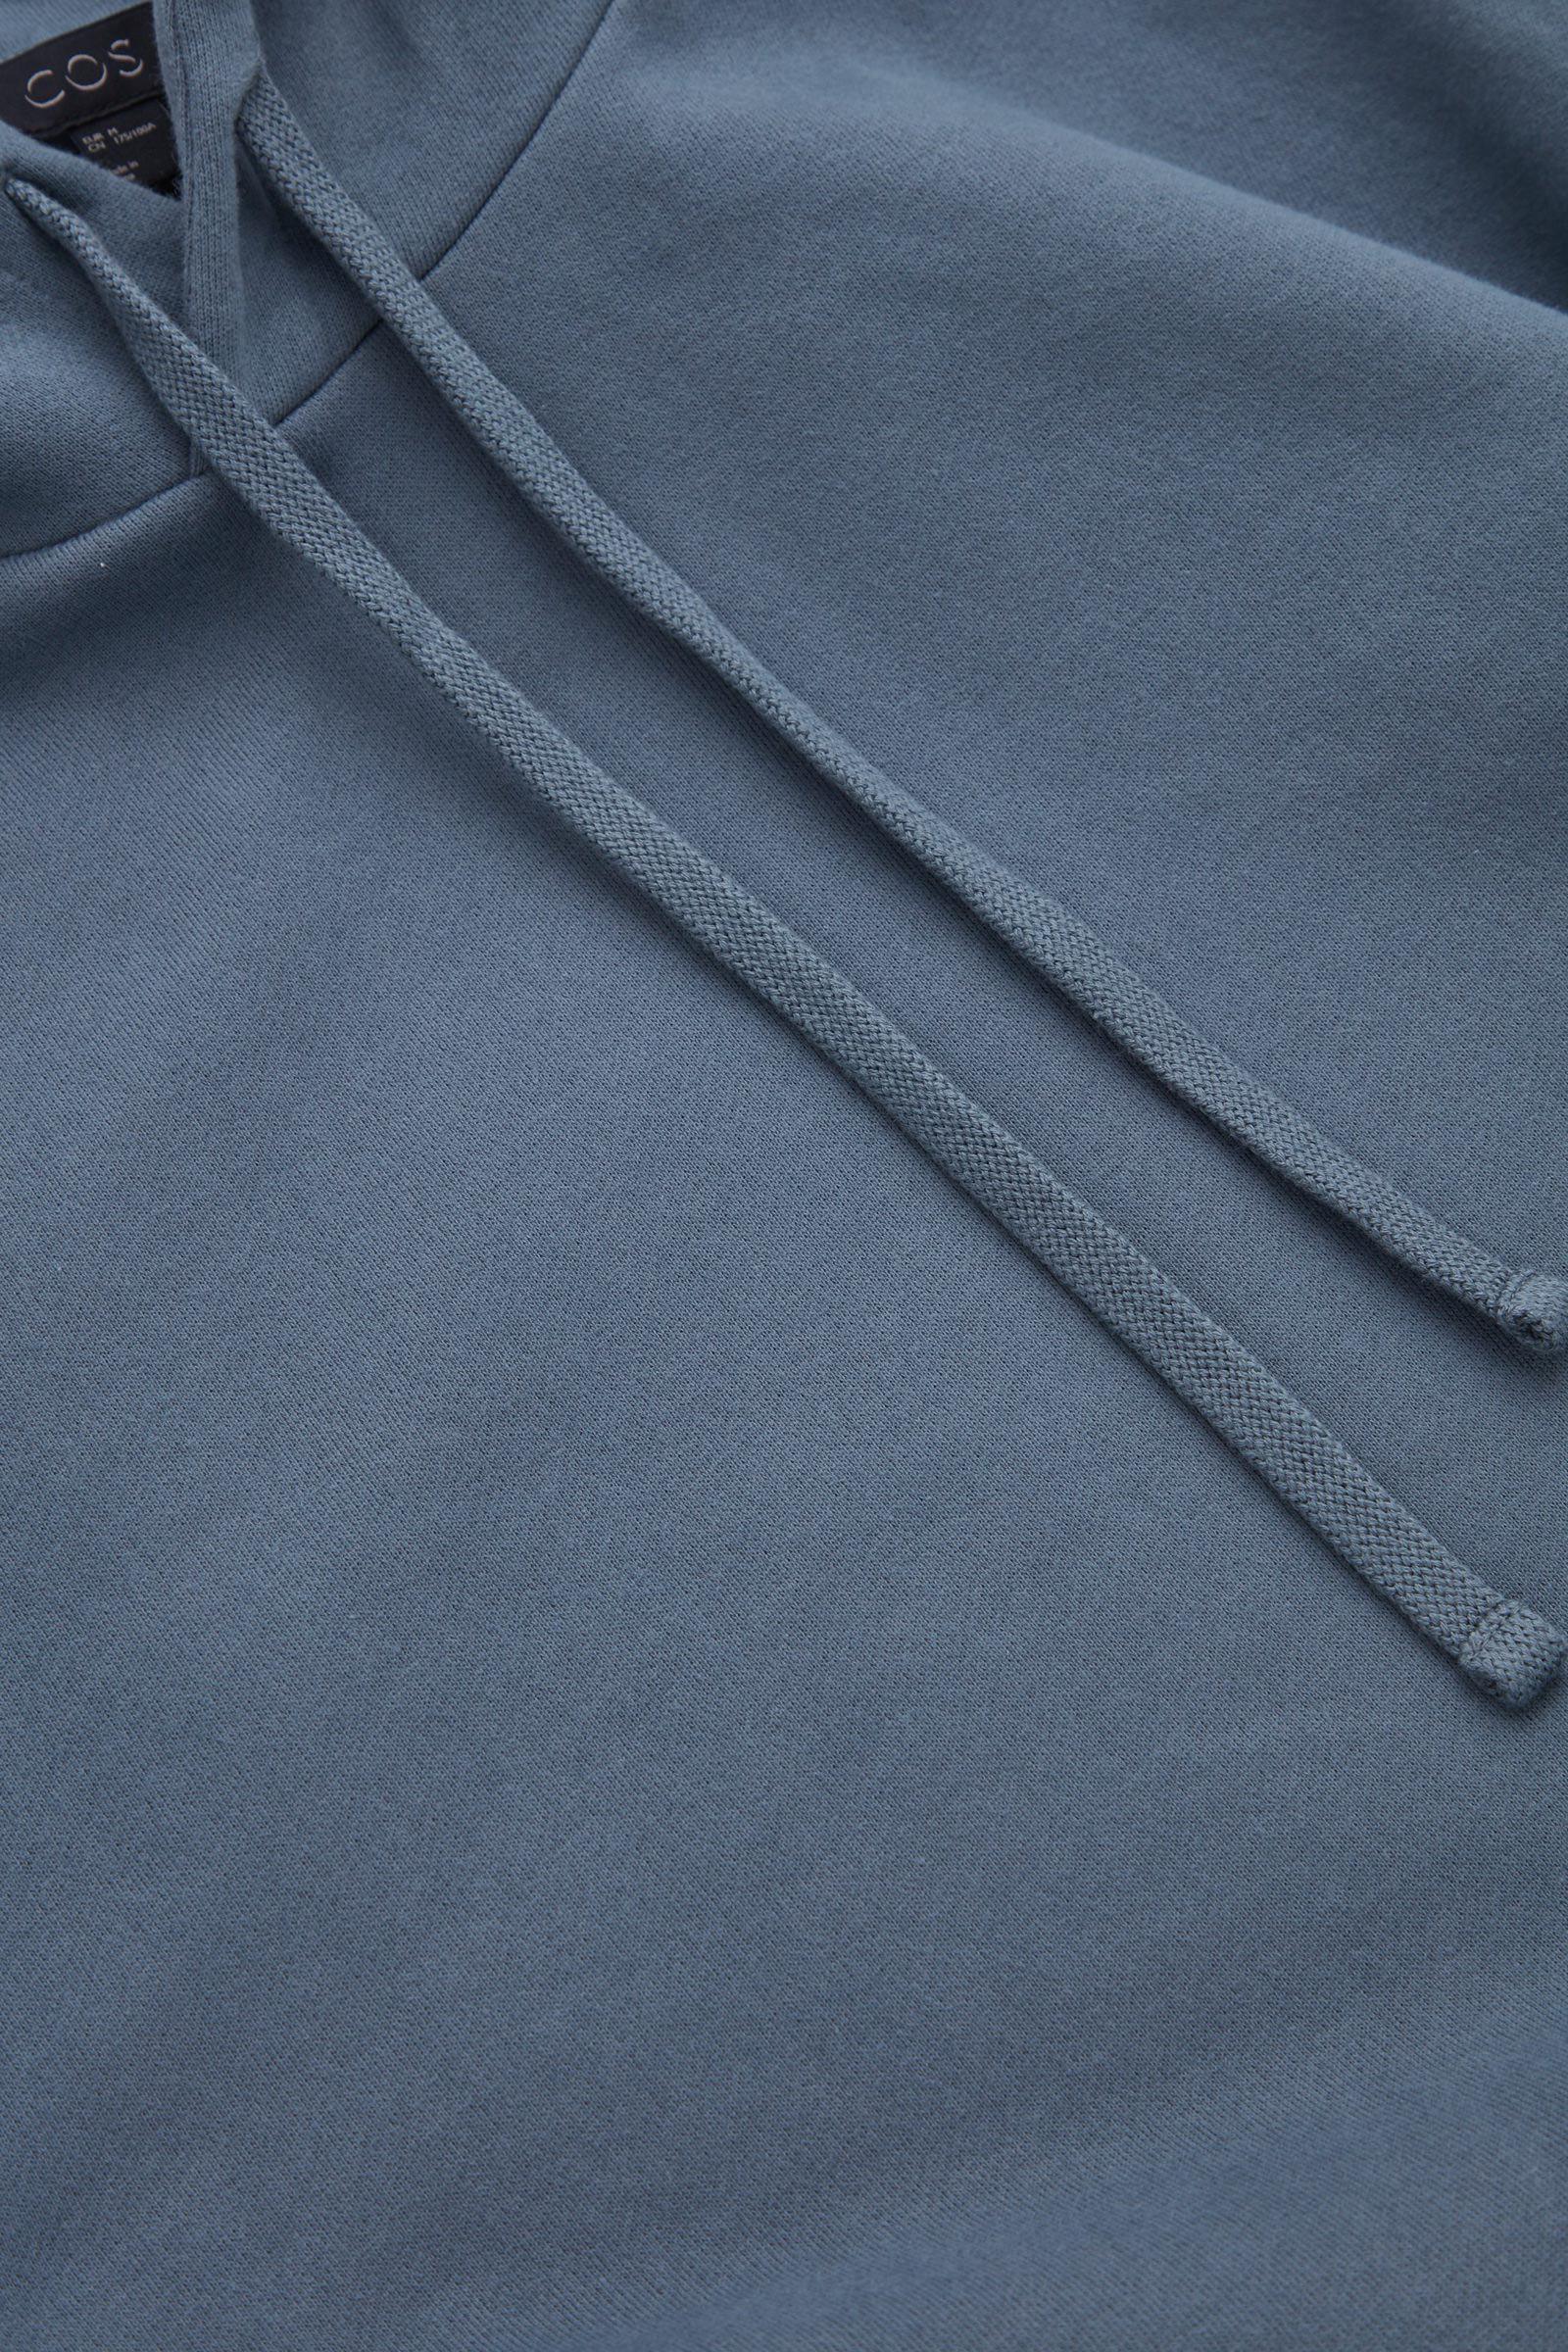 COS 스트럭처드 후디의 네이비컬러 Detail입니다.